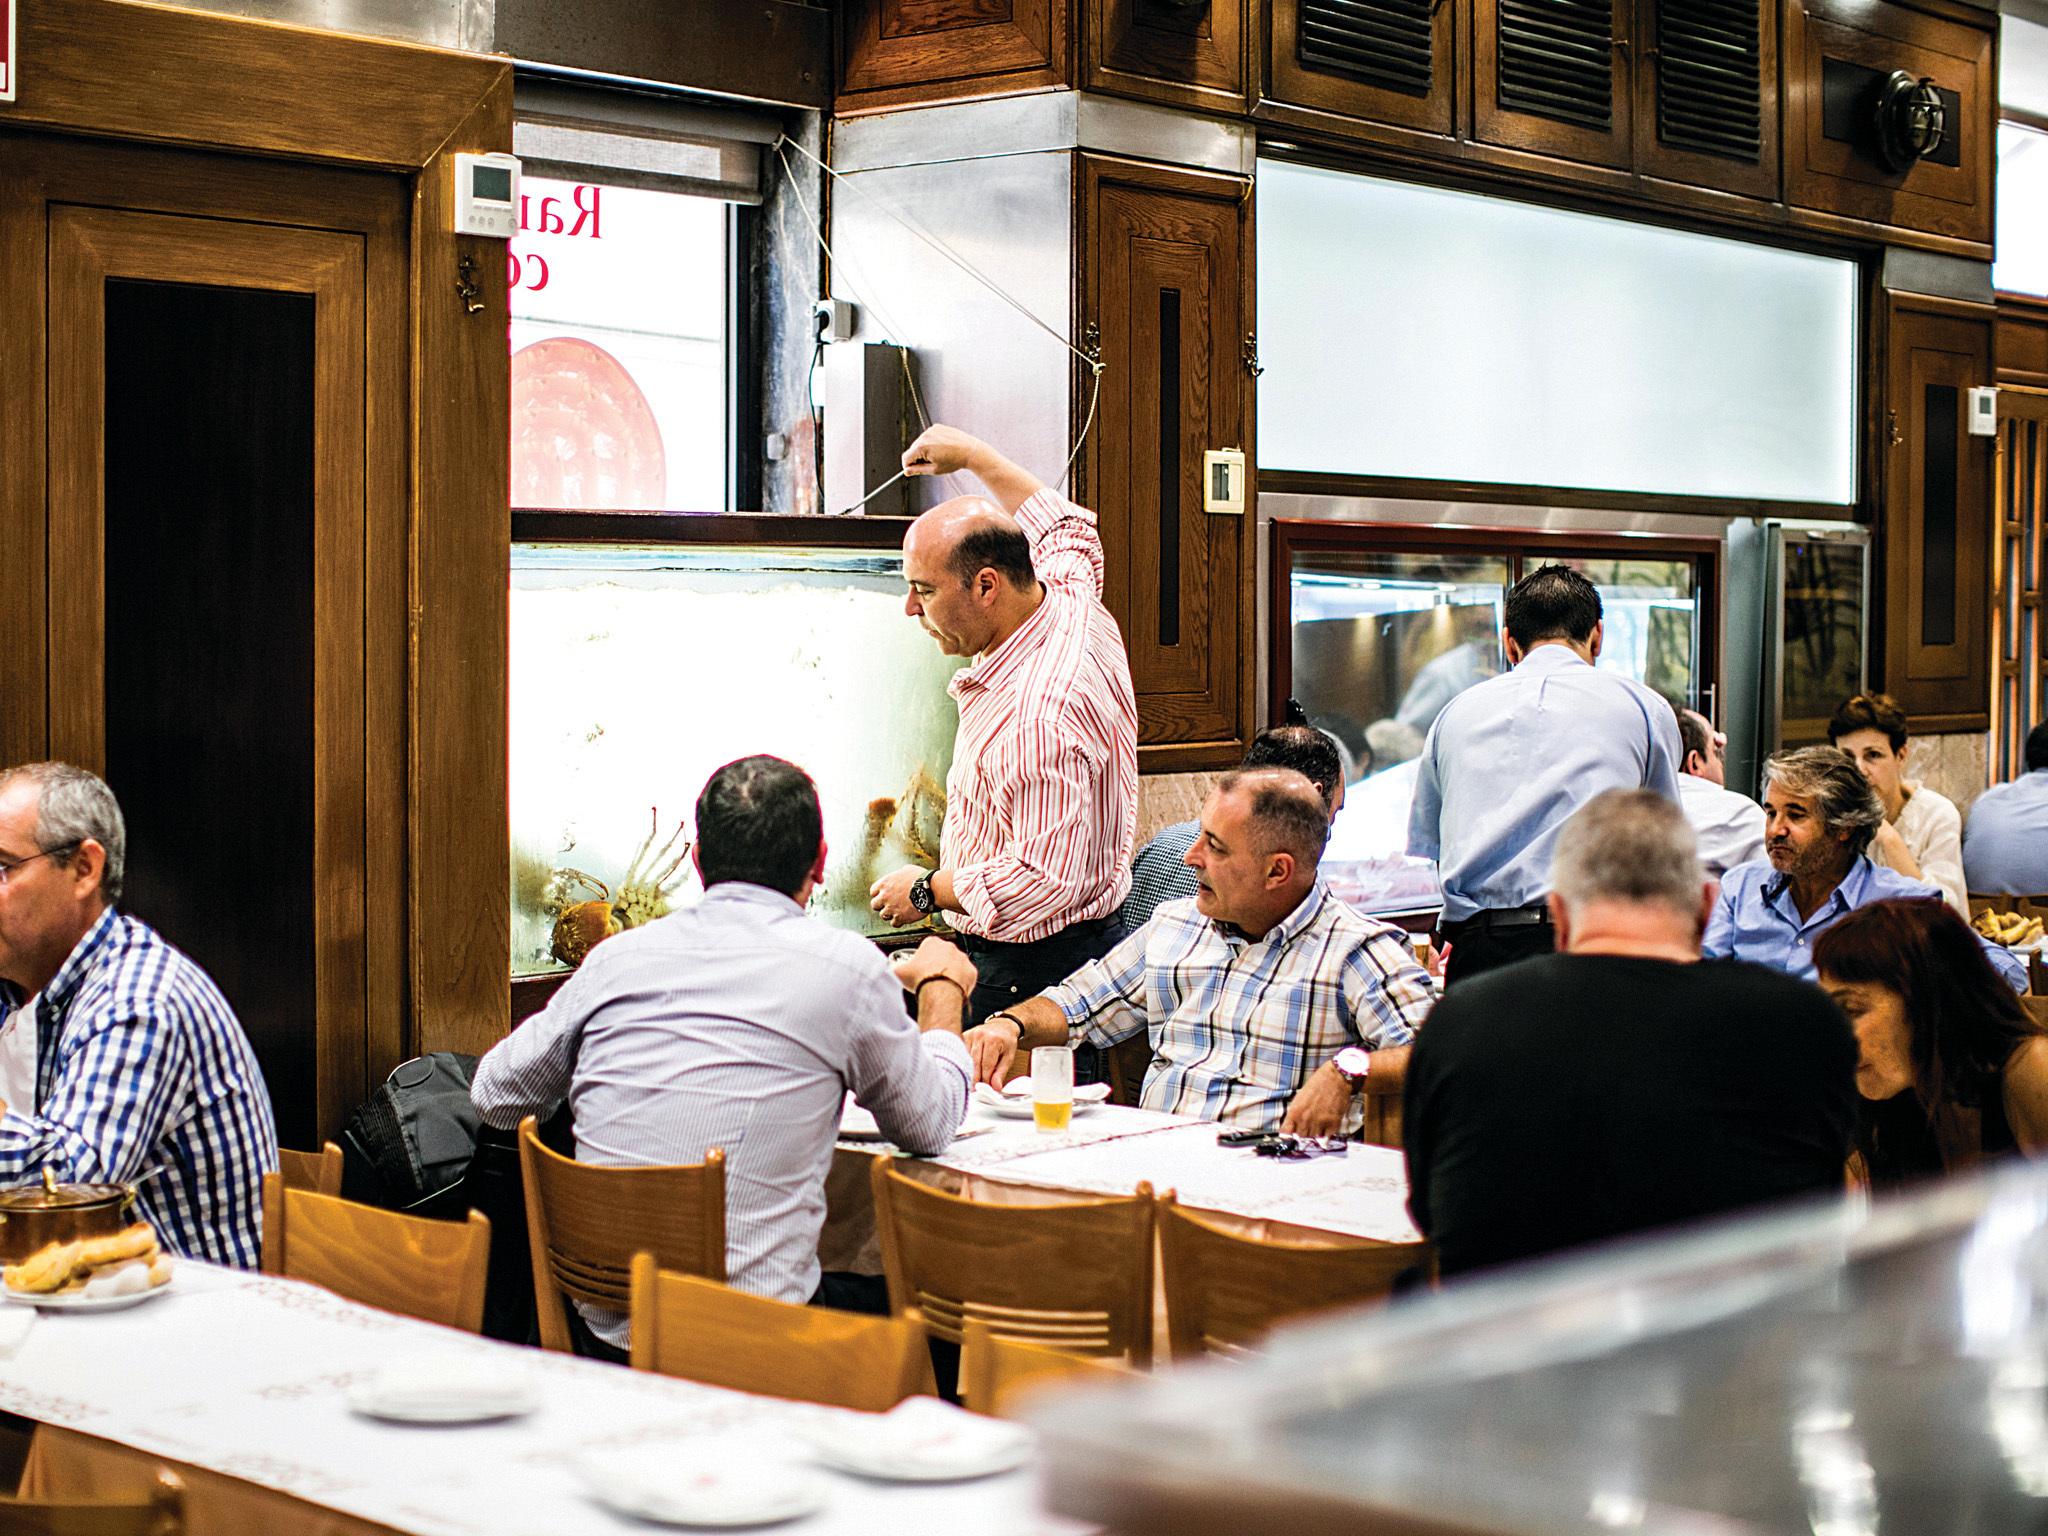 Restaurante Ramiro - Sala